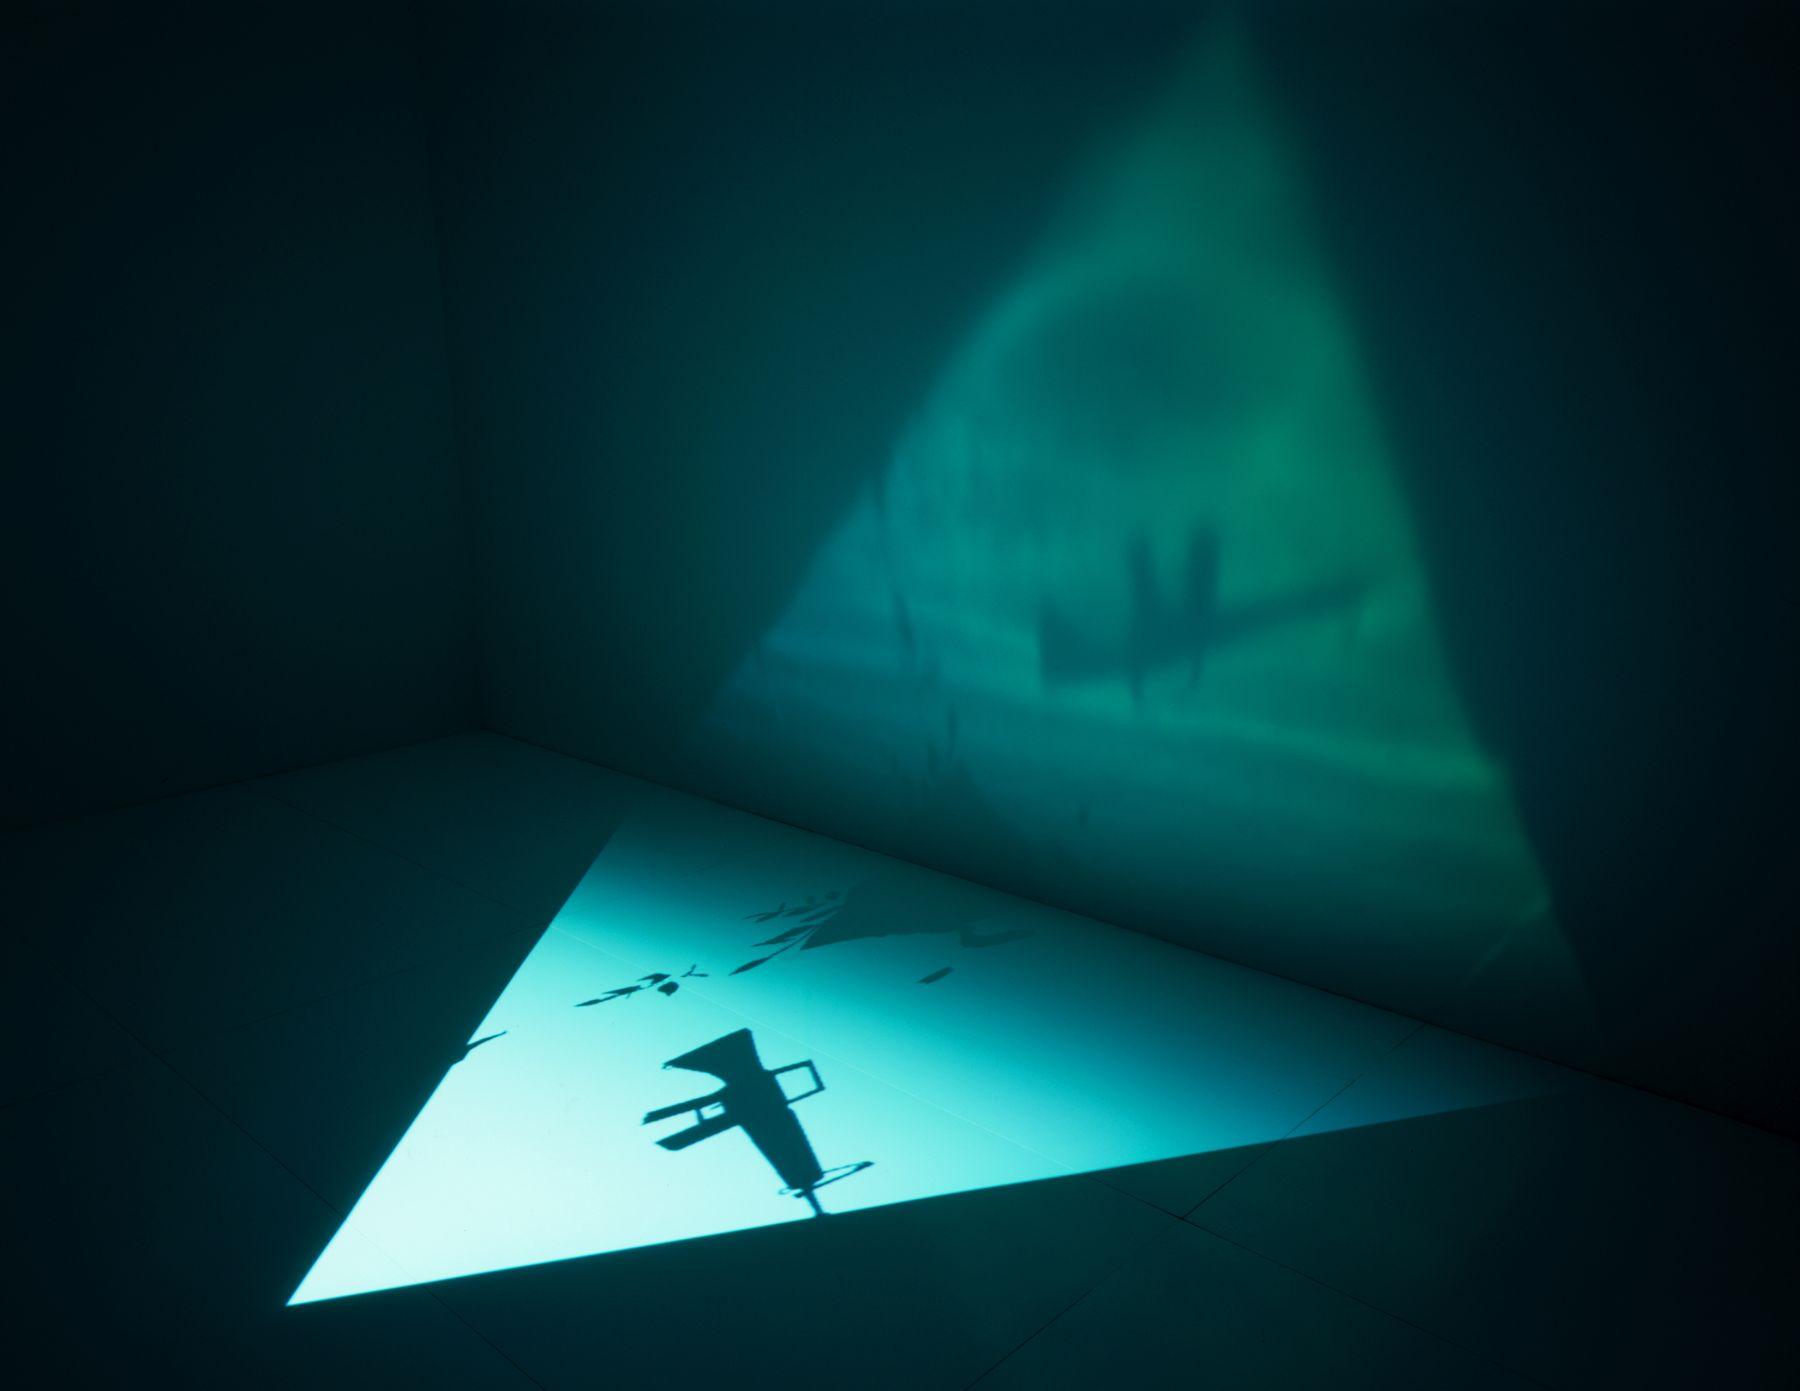 5th Light,2006, digital video projection